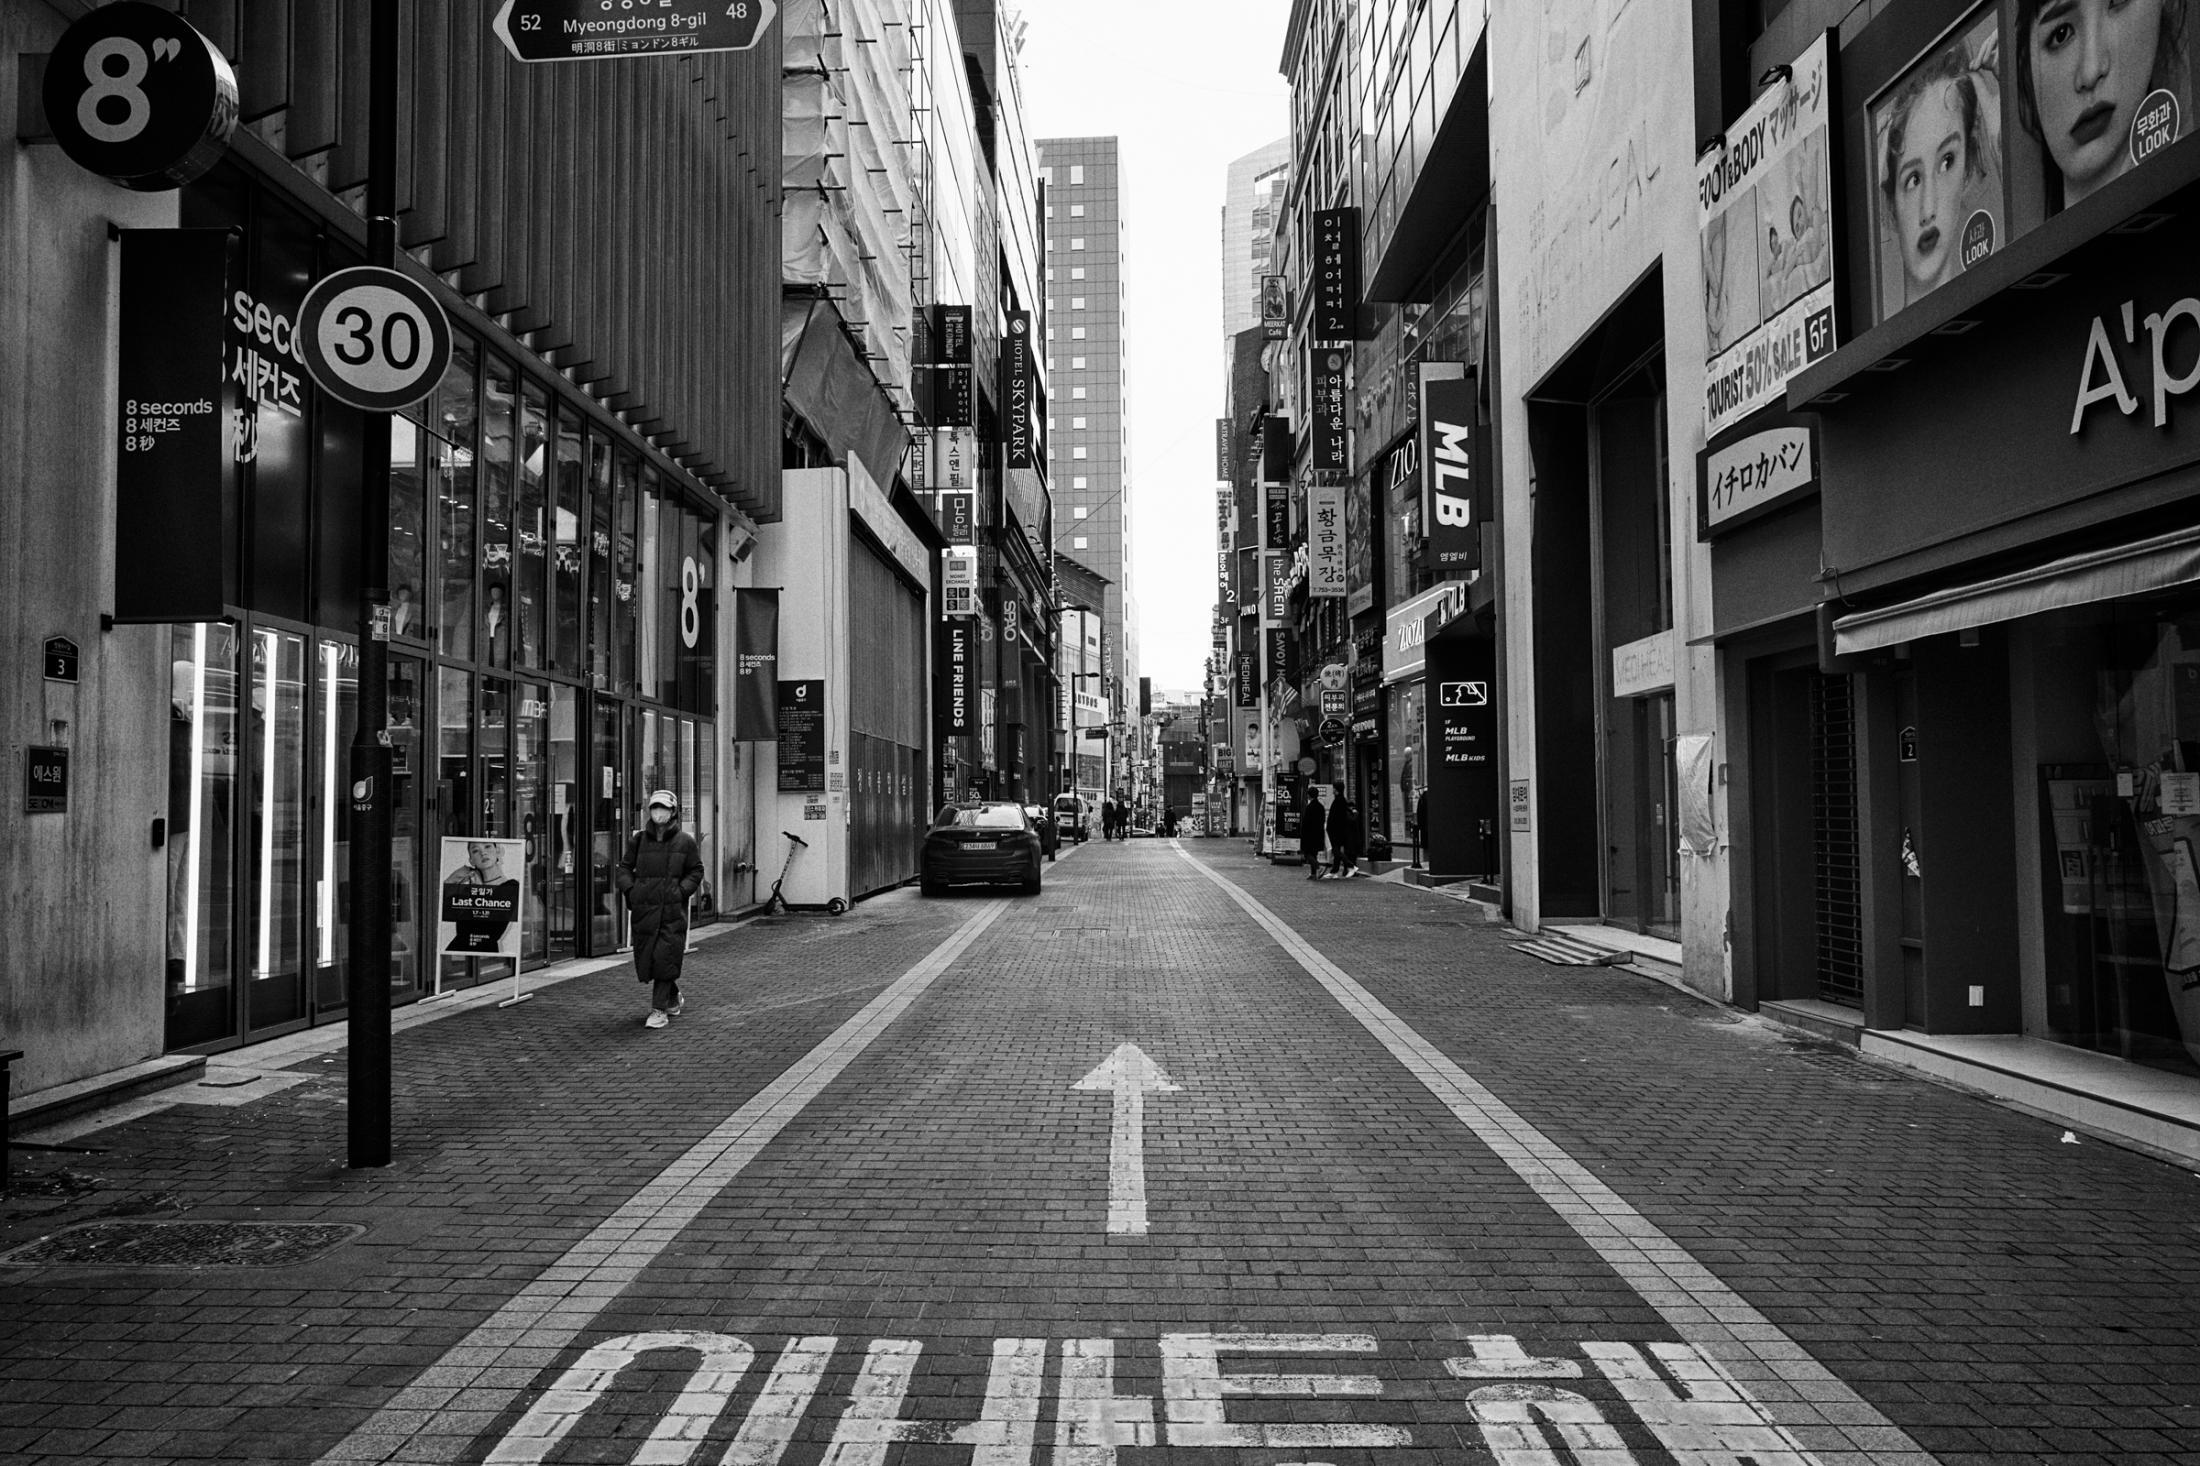 Myungdong, 1:20 p.m. Sunday. Jan. 17, 2021. Seoul, South Korea. 명동, 서울. 2021년 1월 17일 일요일 오후 1시 20분.